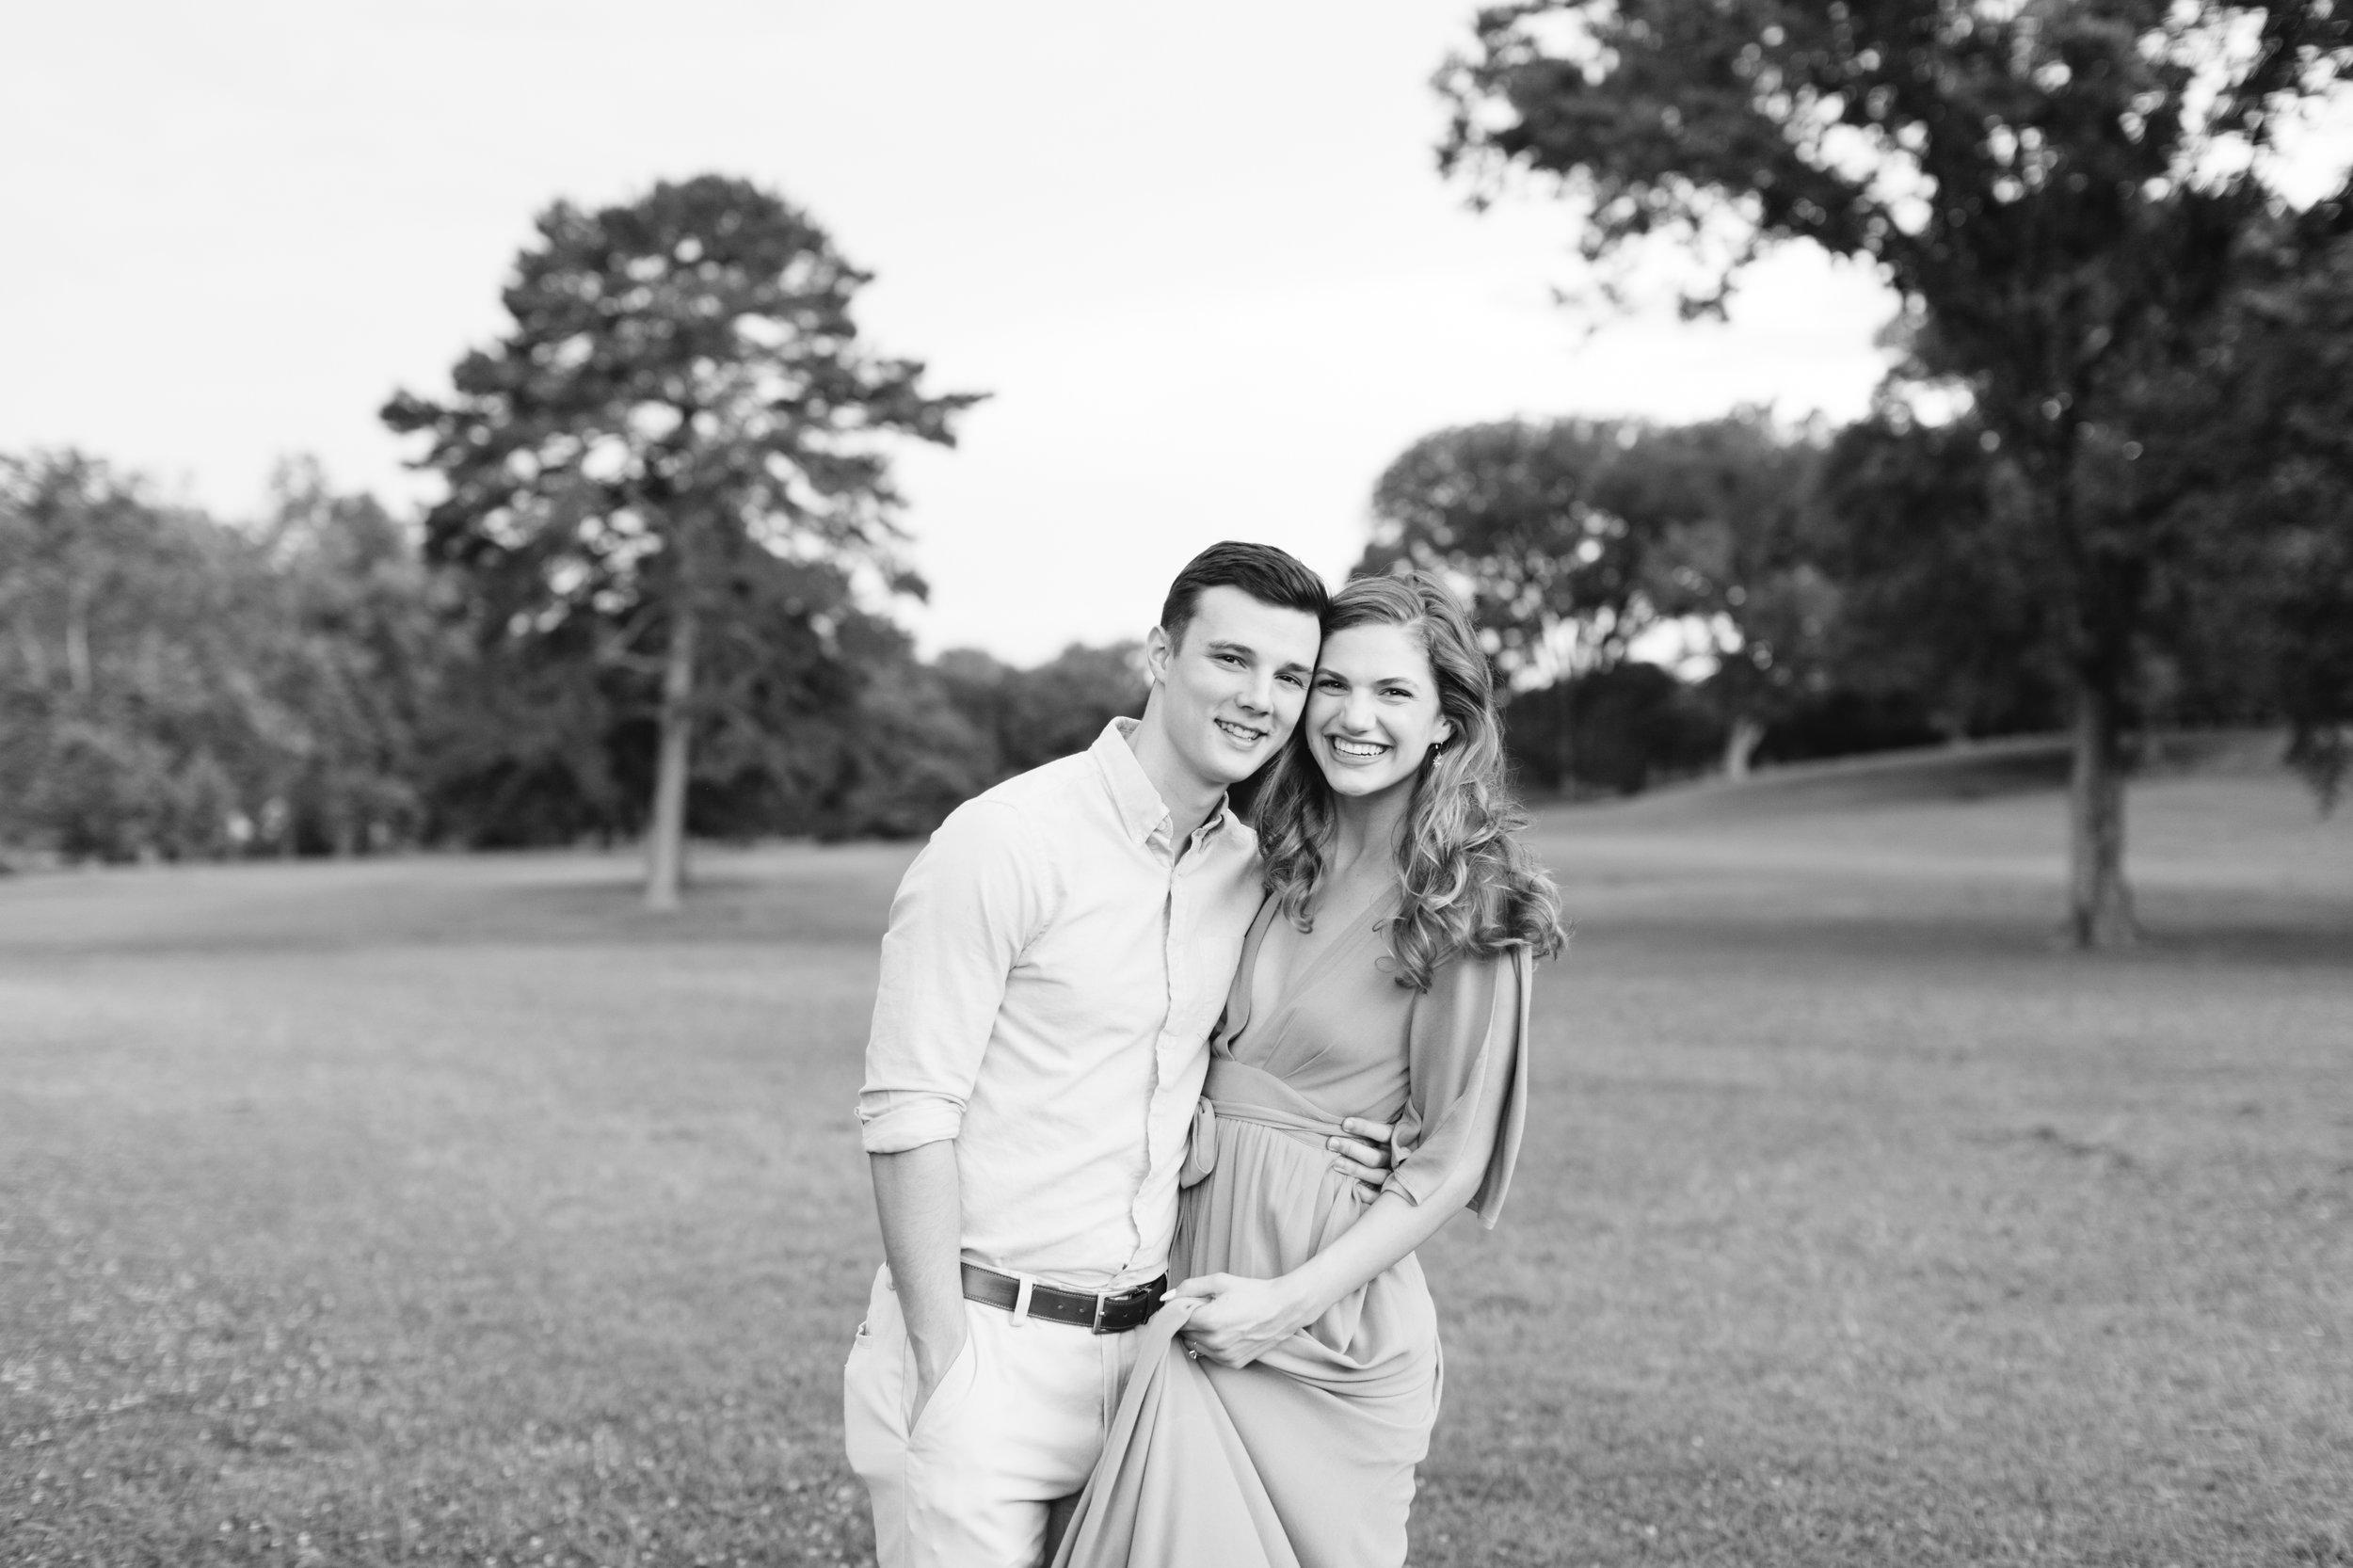 Rachel_Brandon_Engagement_Photos_Knoxville_Abigail_Malone_Phography-102.jpg